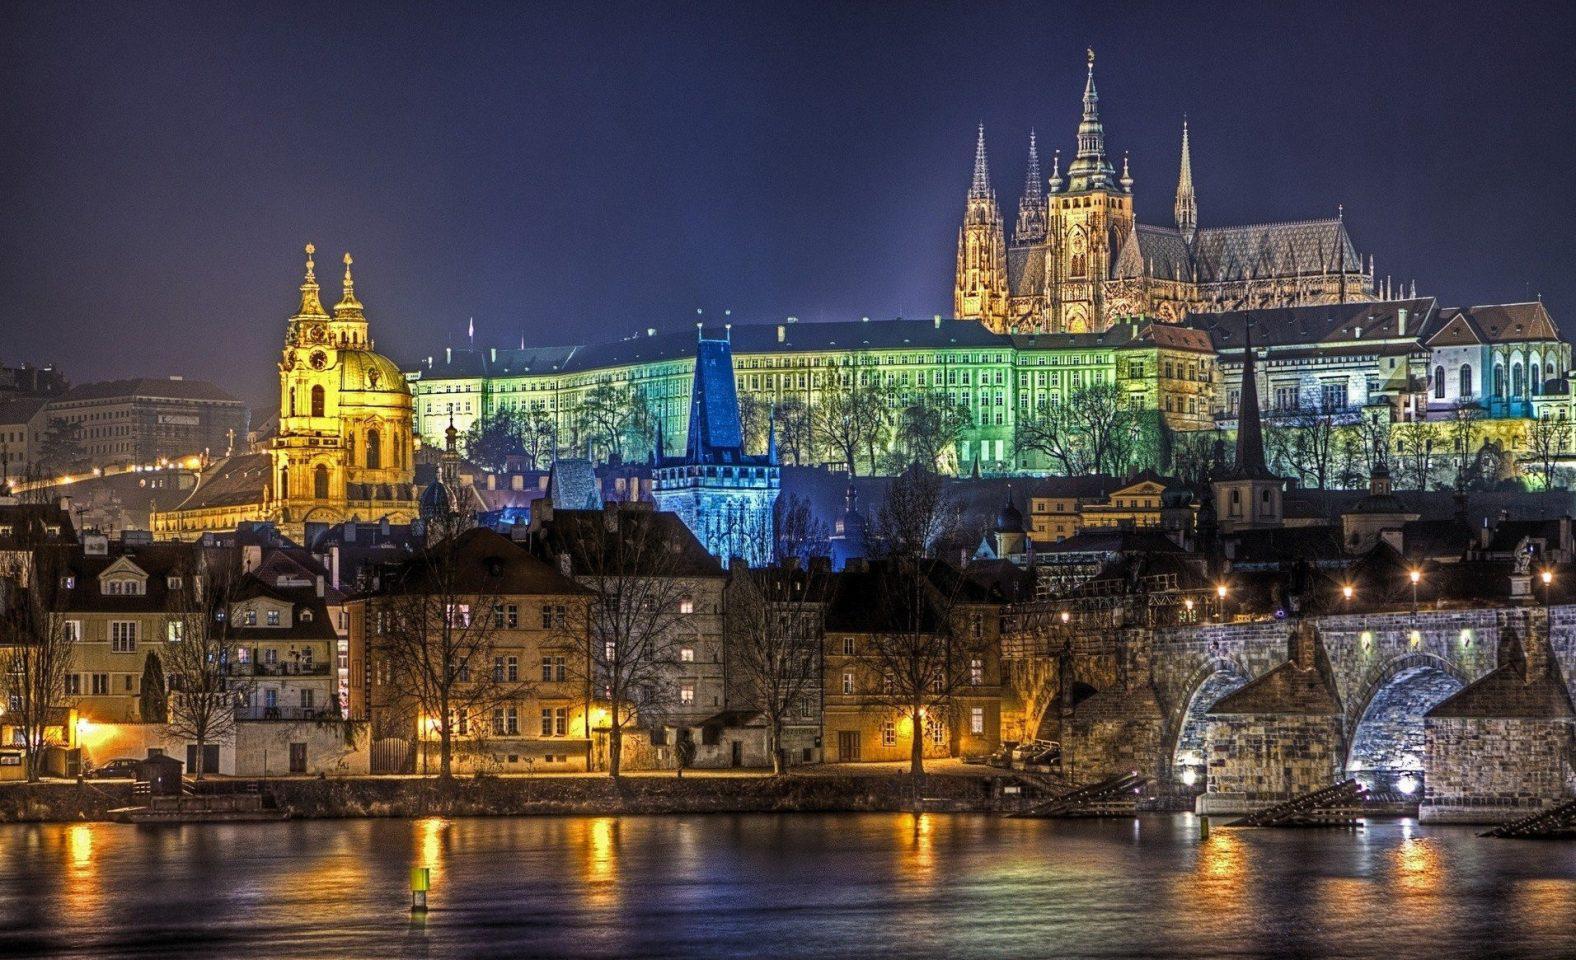 krakovia Μέρη που αξίζει να επισκεφτείς μέσα στο 2017 (μέρος β')